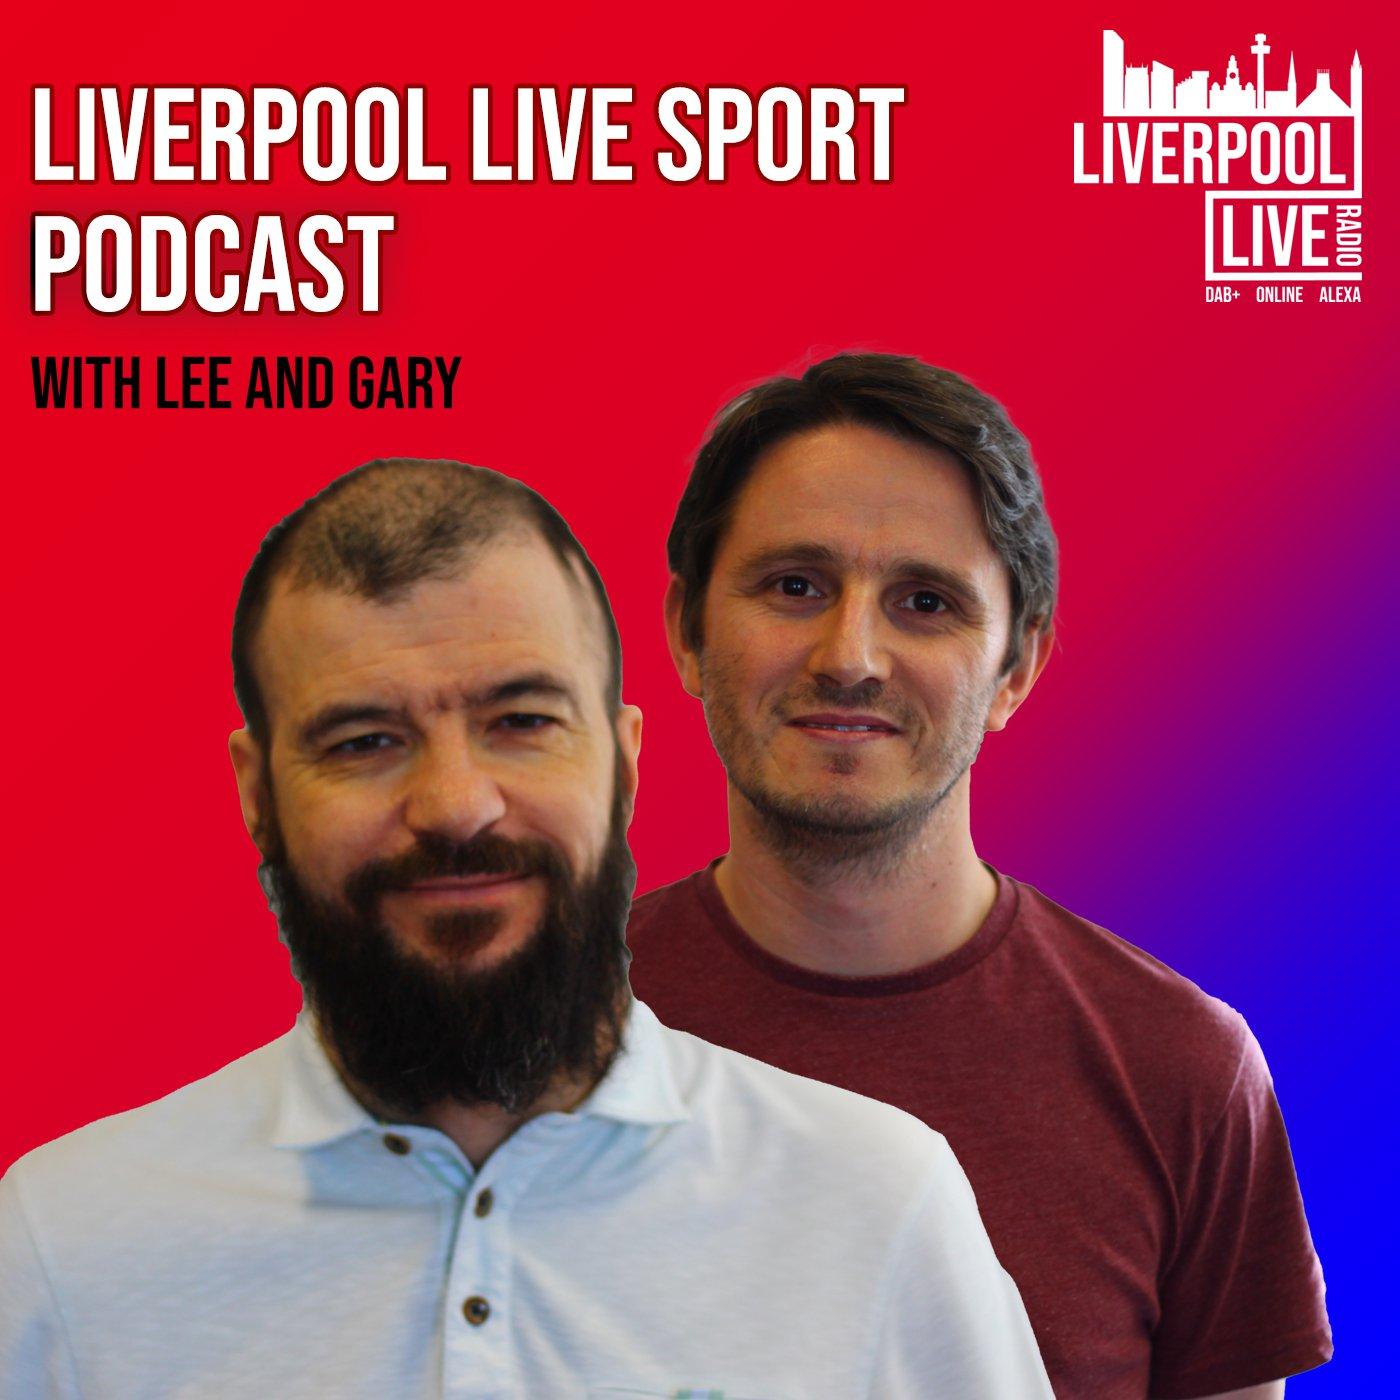 Liverpool Live Sport